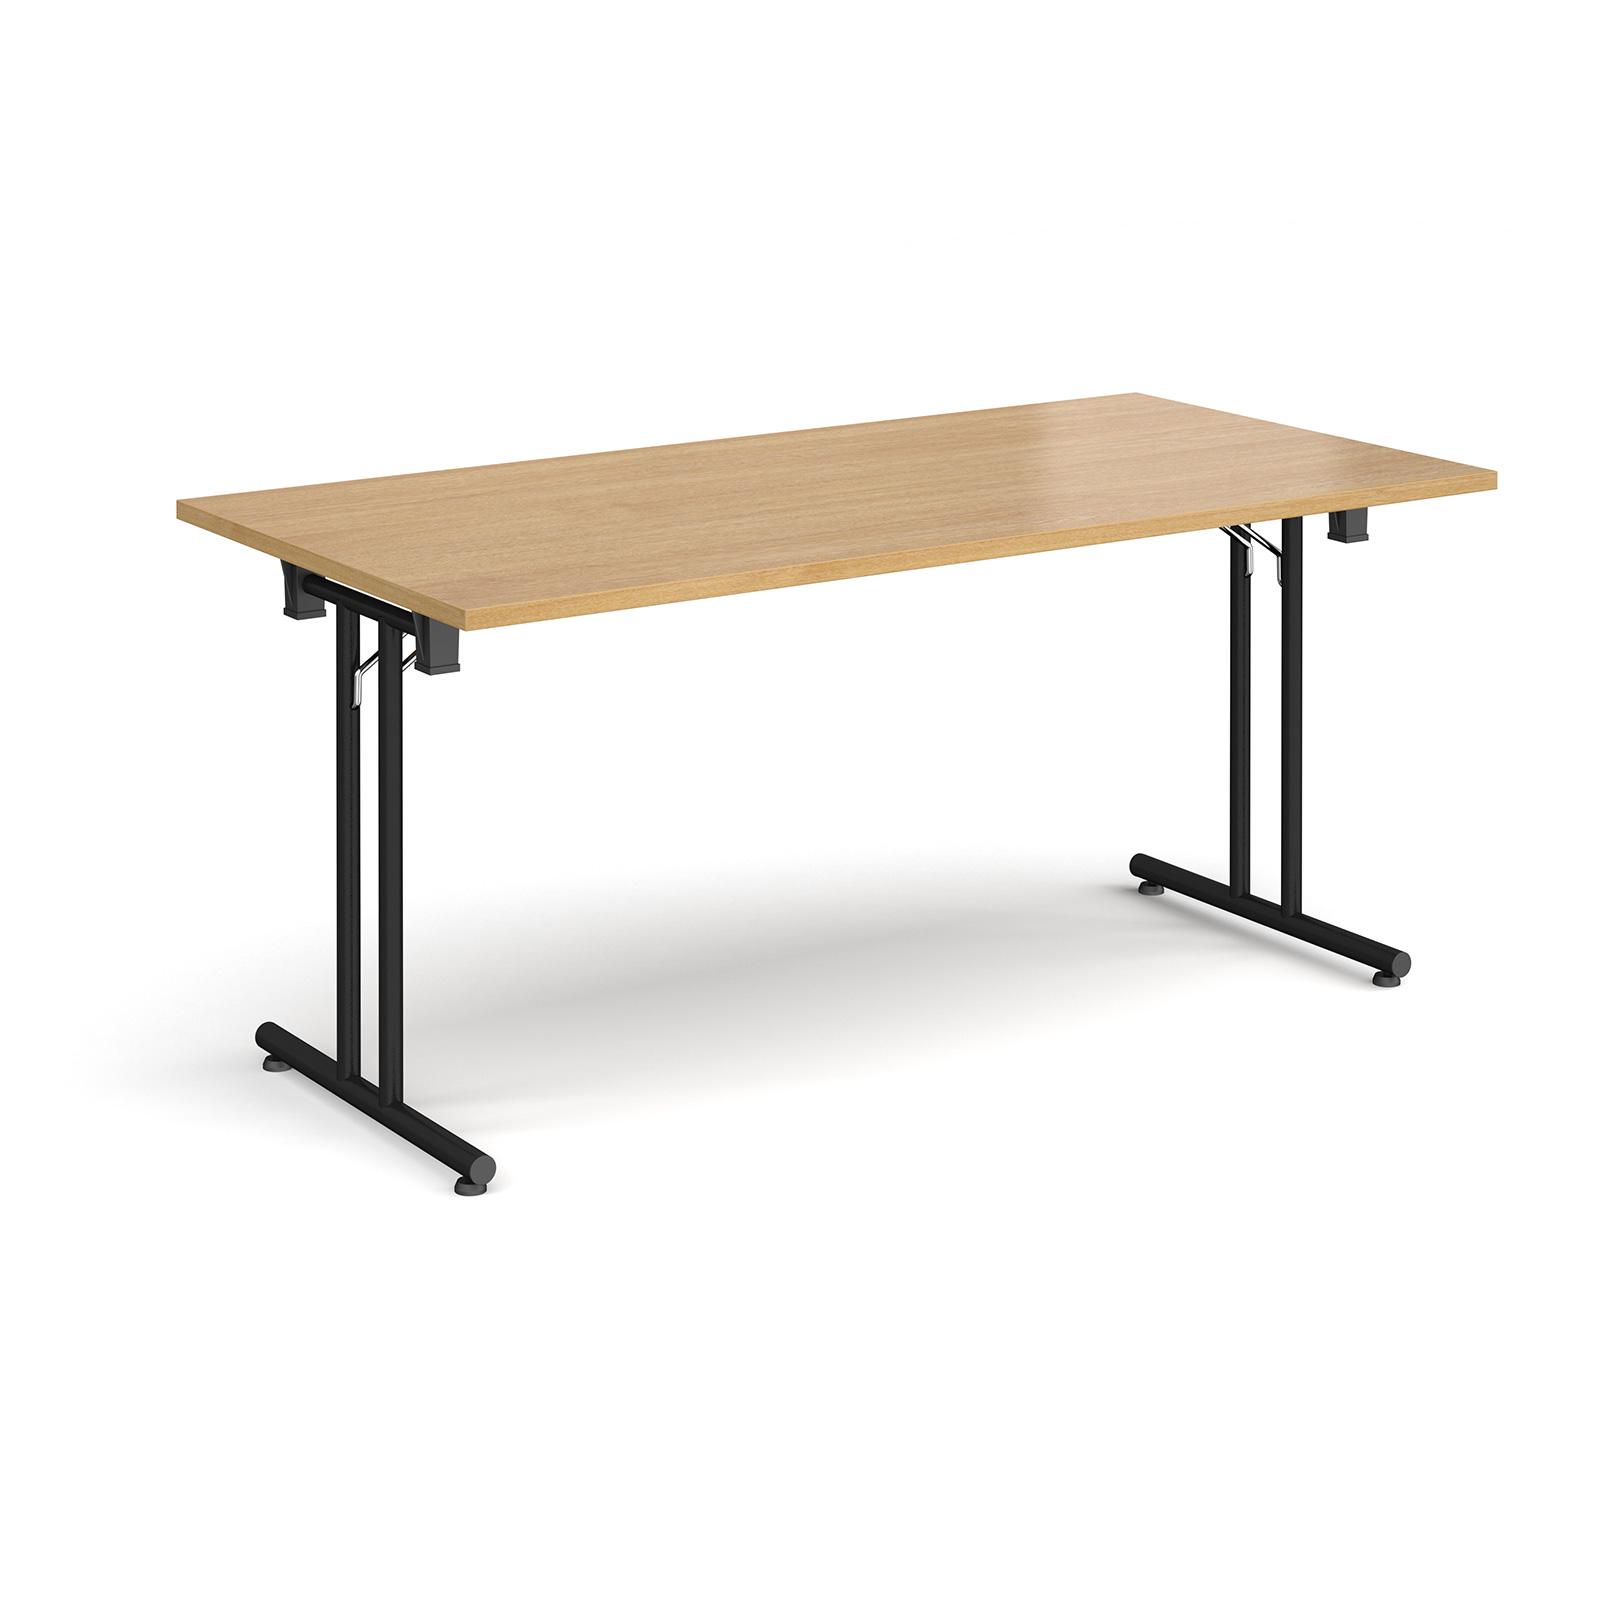 Rectangular Folding Leg Table With Black And Straight Foot Rails 1600mm X 800mm Oak